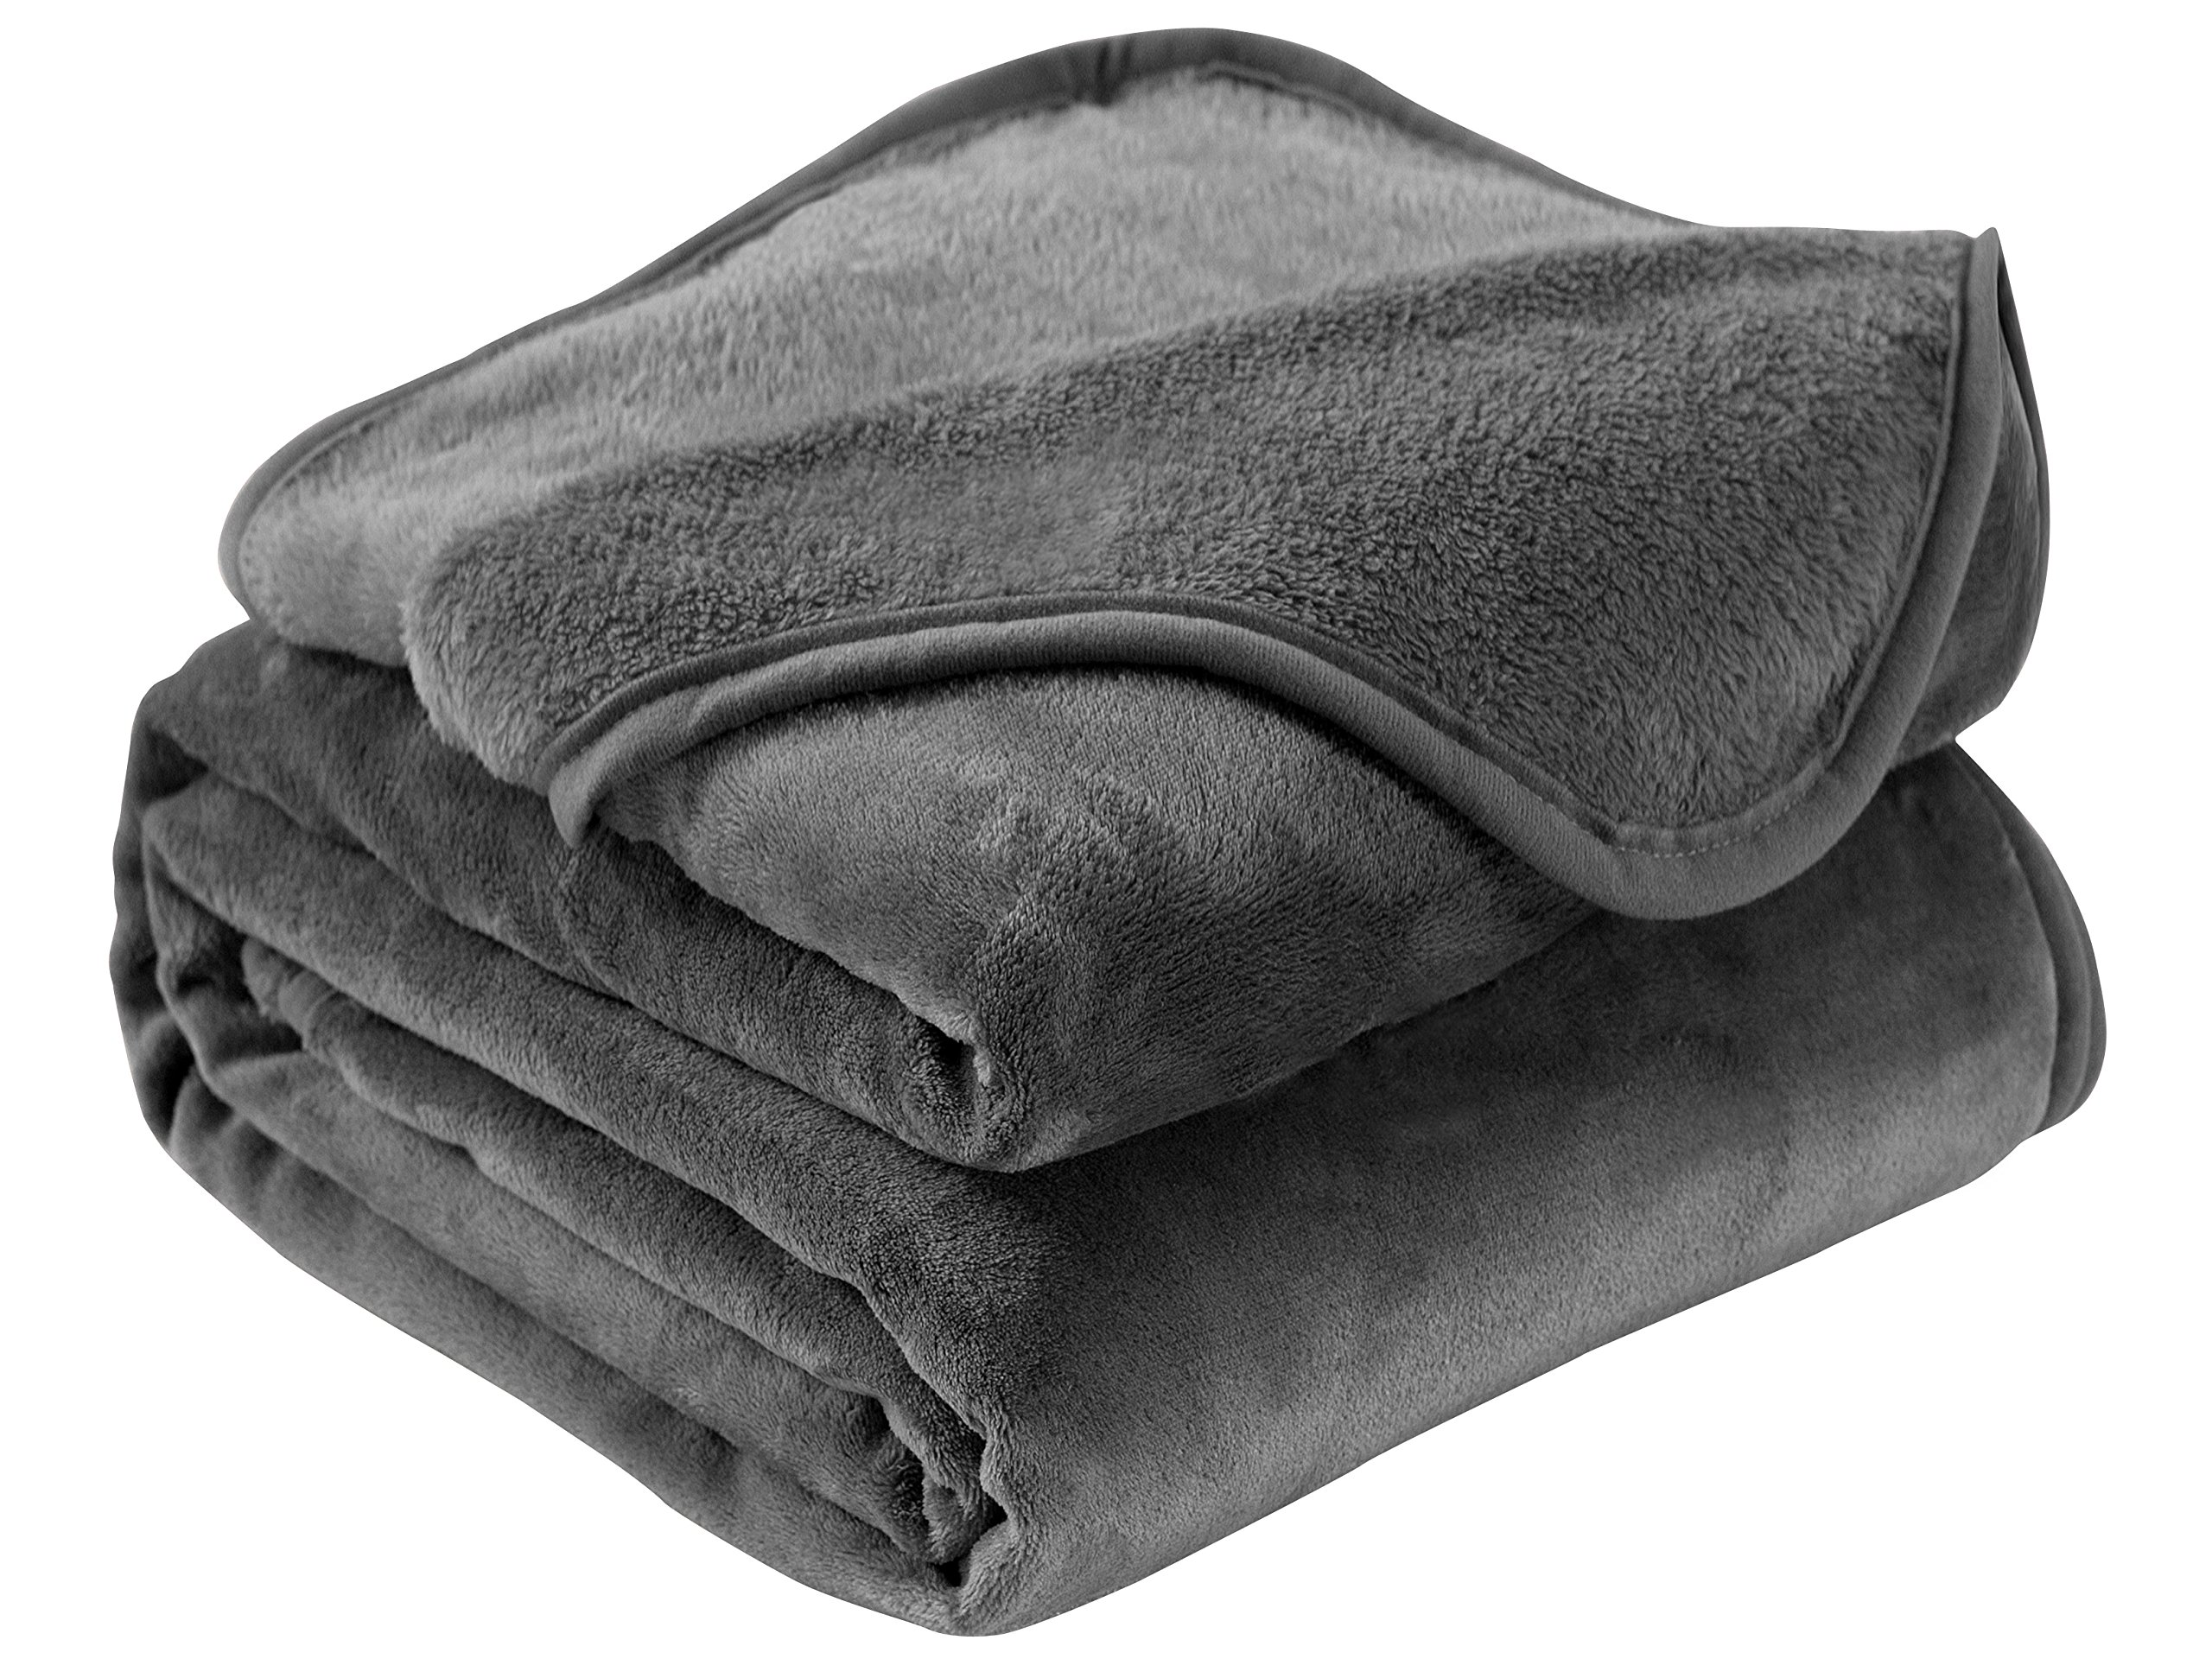 Exclusivo Mezcla Luxury Queen Size Flannel Velvet Plush Solid Bed Blanket (90'' x 90'', Grey) - Soft, Lightweight, Warm and Cozy